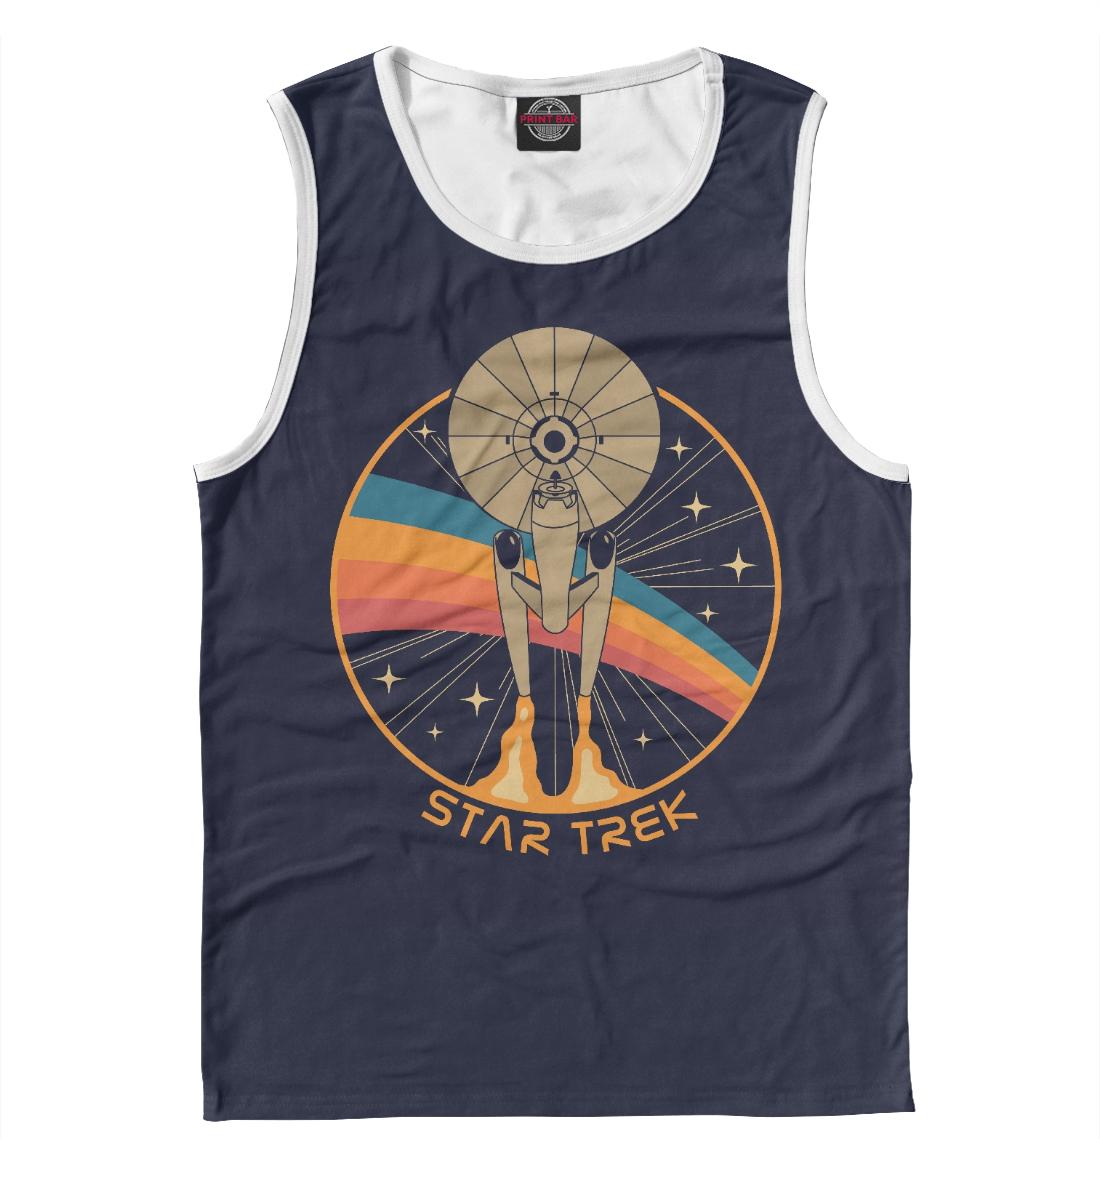 Star Trek, Printbar, Майки, STT-988214-may-2  - купить со скидкой